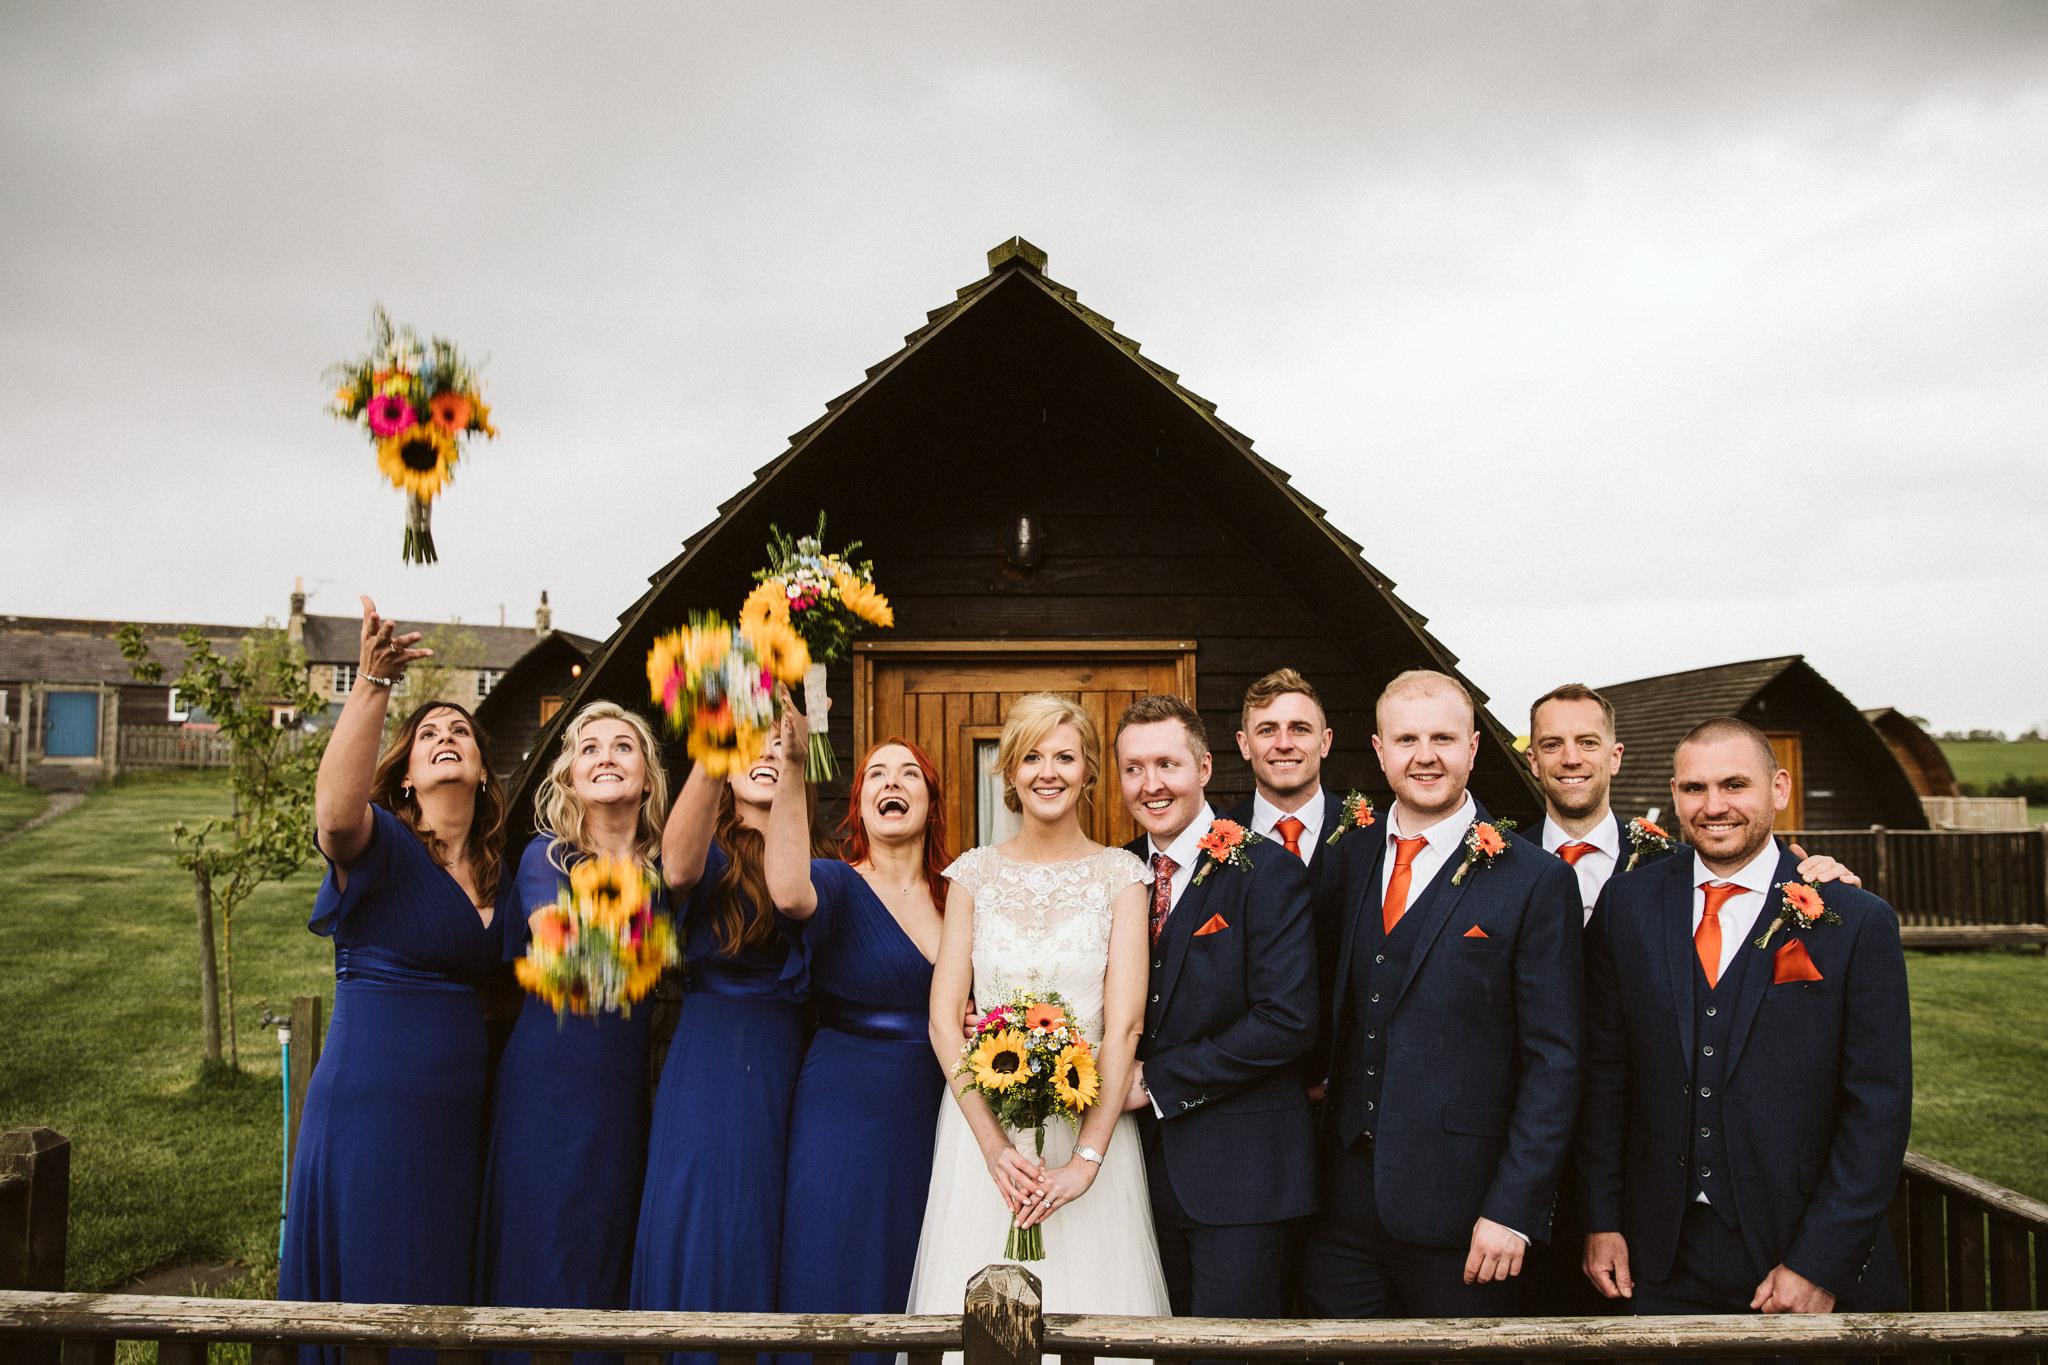 northside-farm-wedding-northumberland-margarita-hope (94).jpg